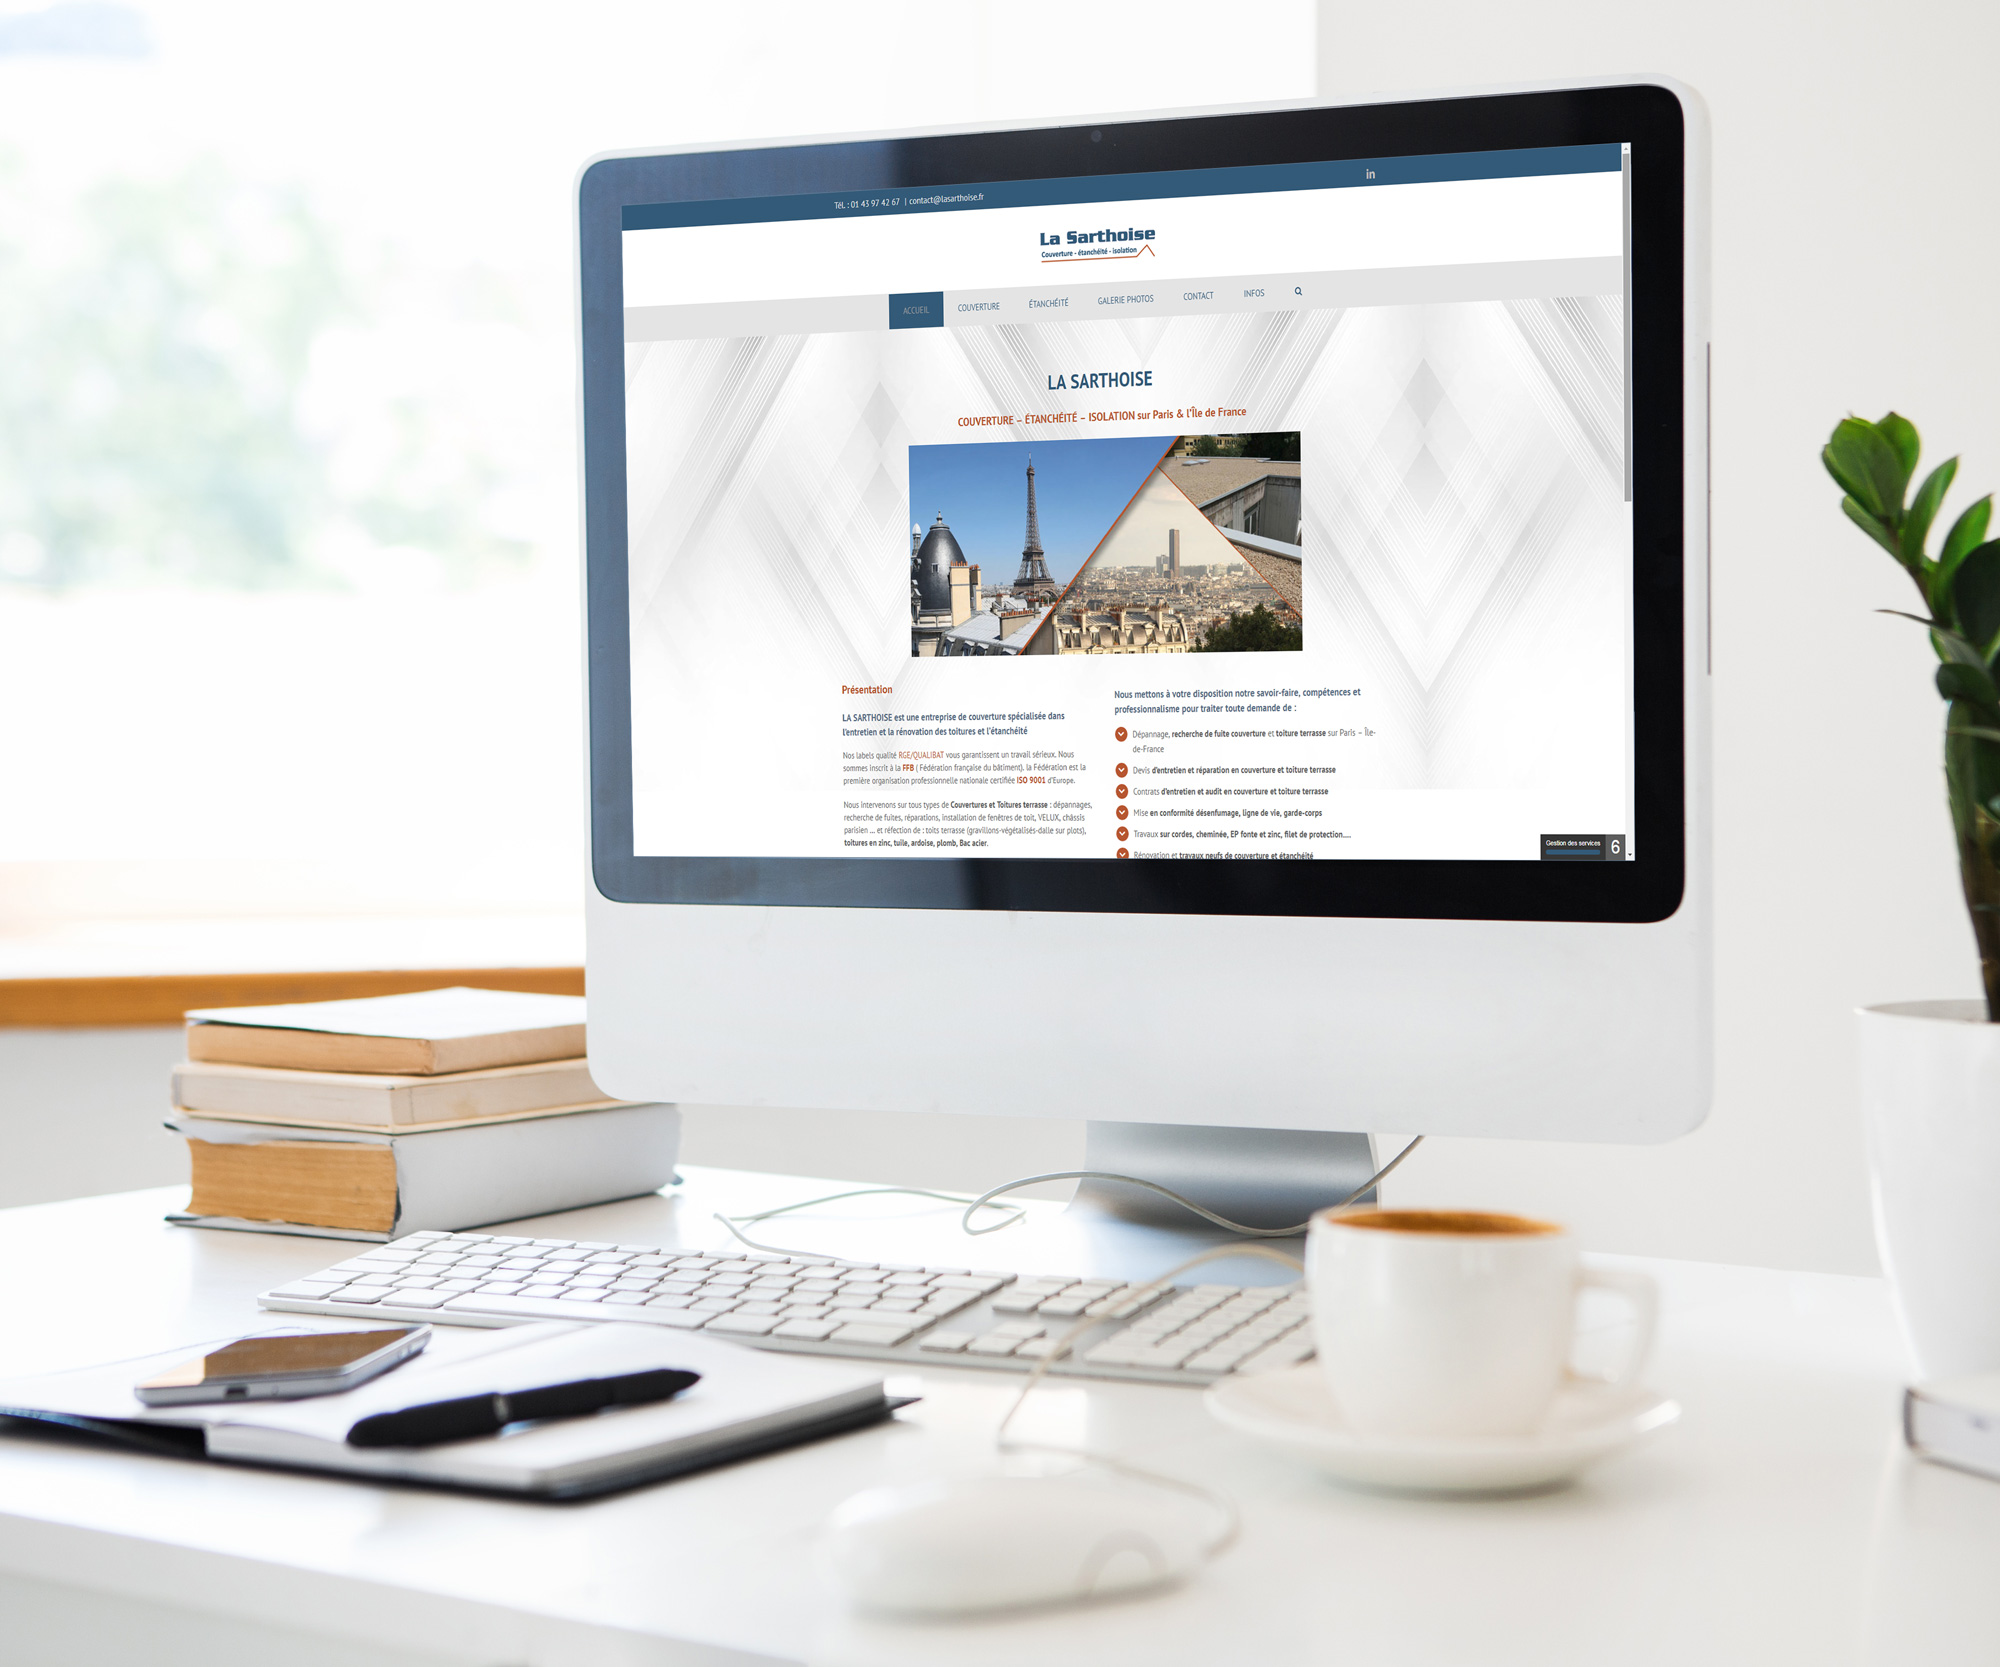 site-webdesigner-94-la-sarthoise-steph-webdesign.jpg